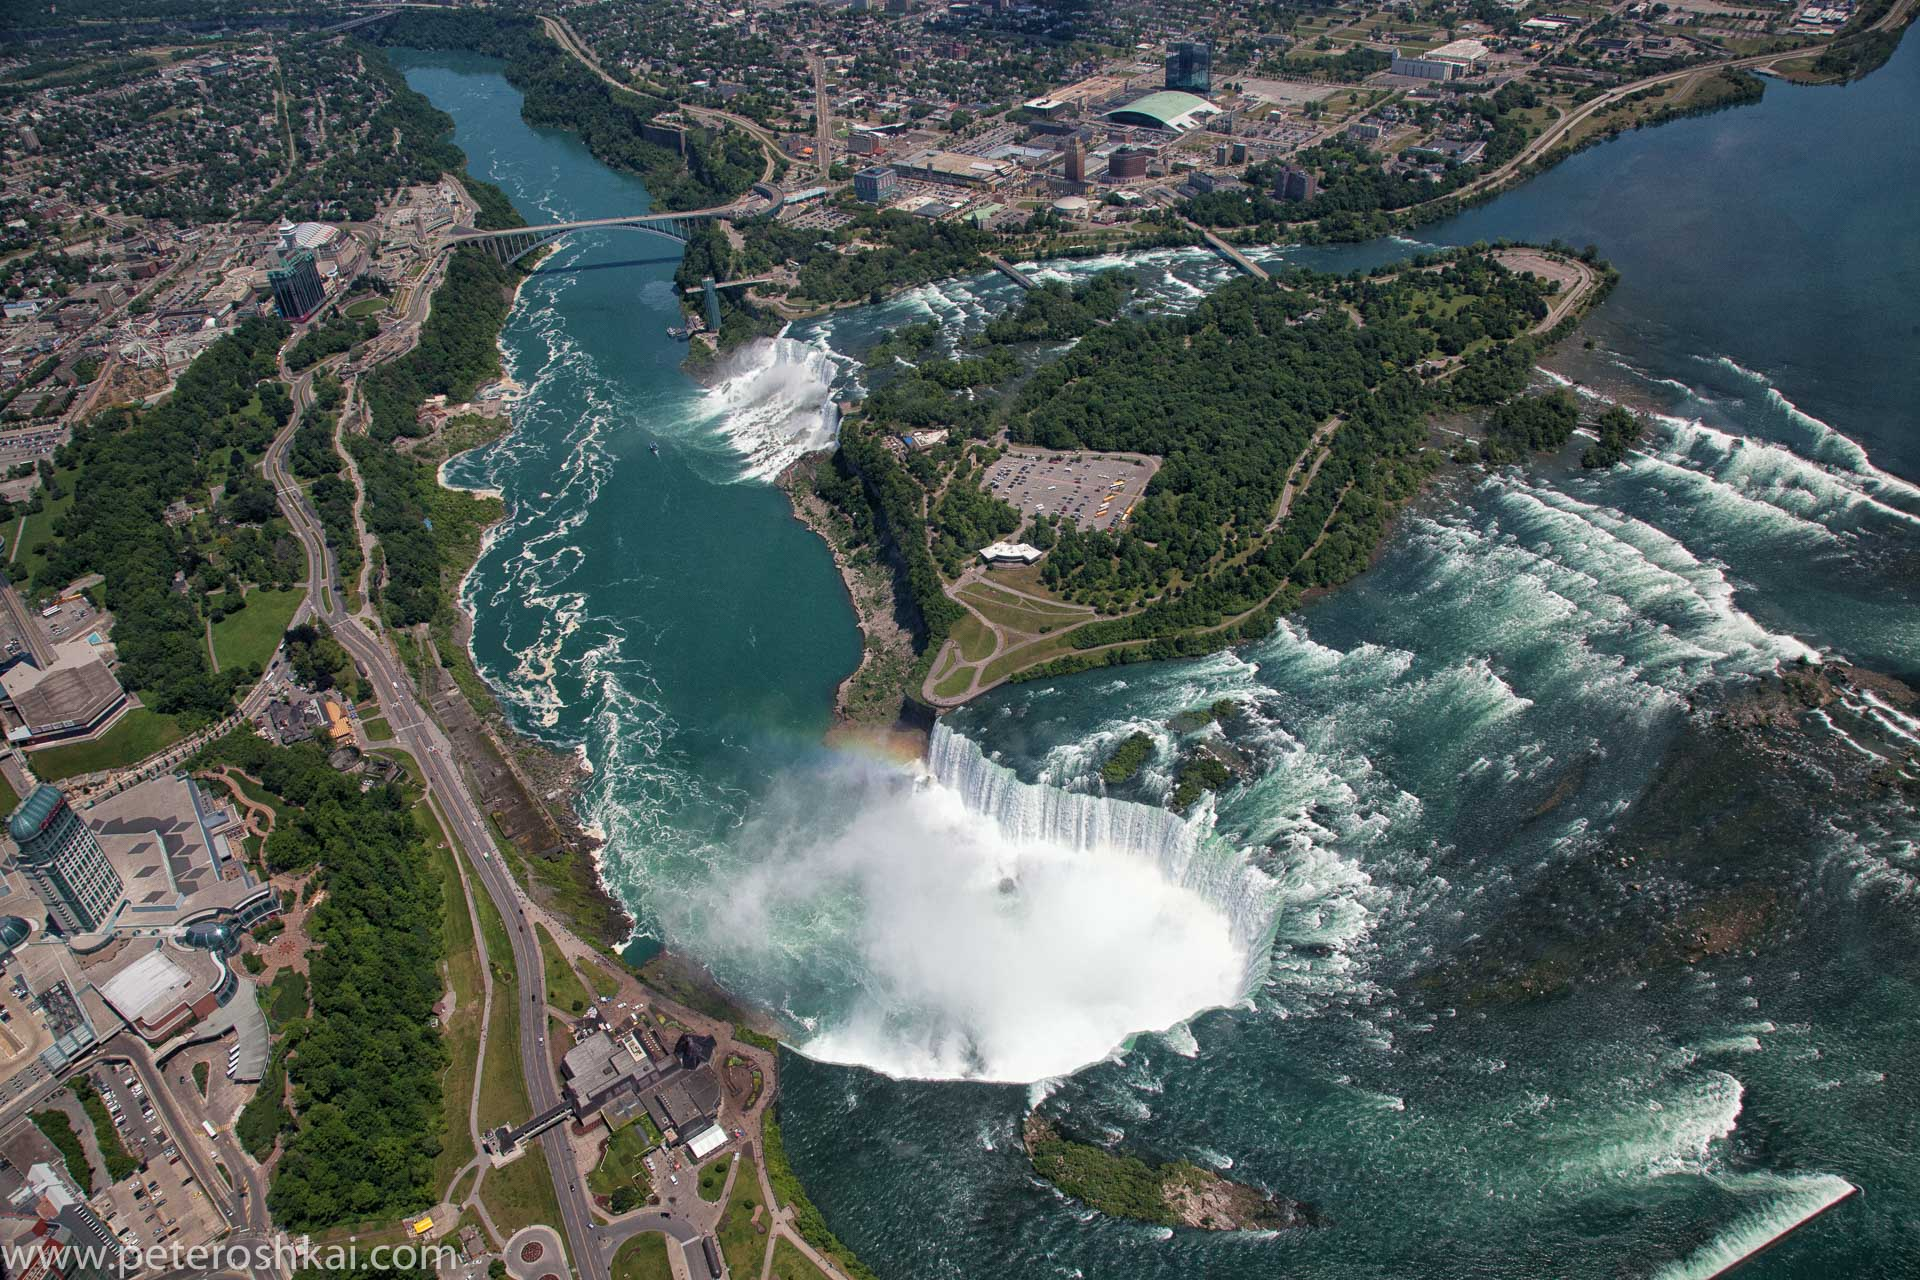 Escorts Niagara Falls Canada Young Street Hooker Tradeit